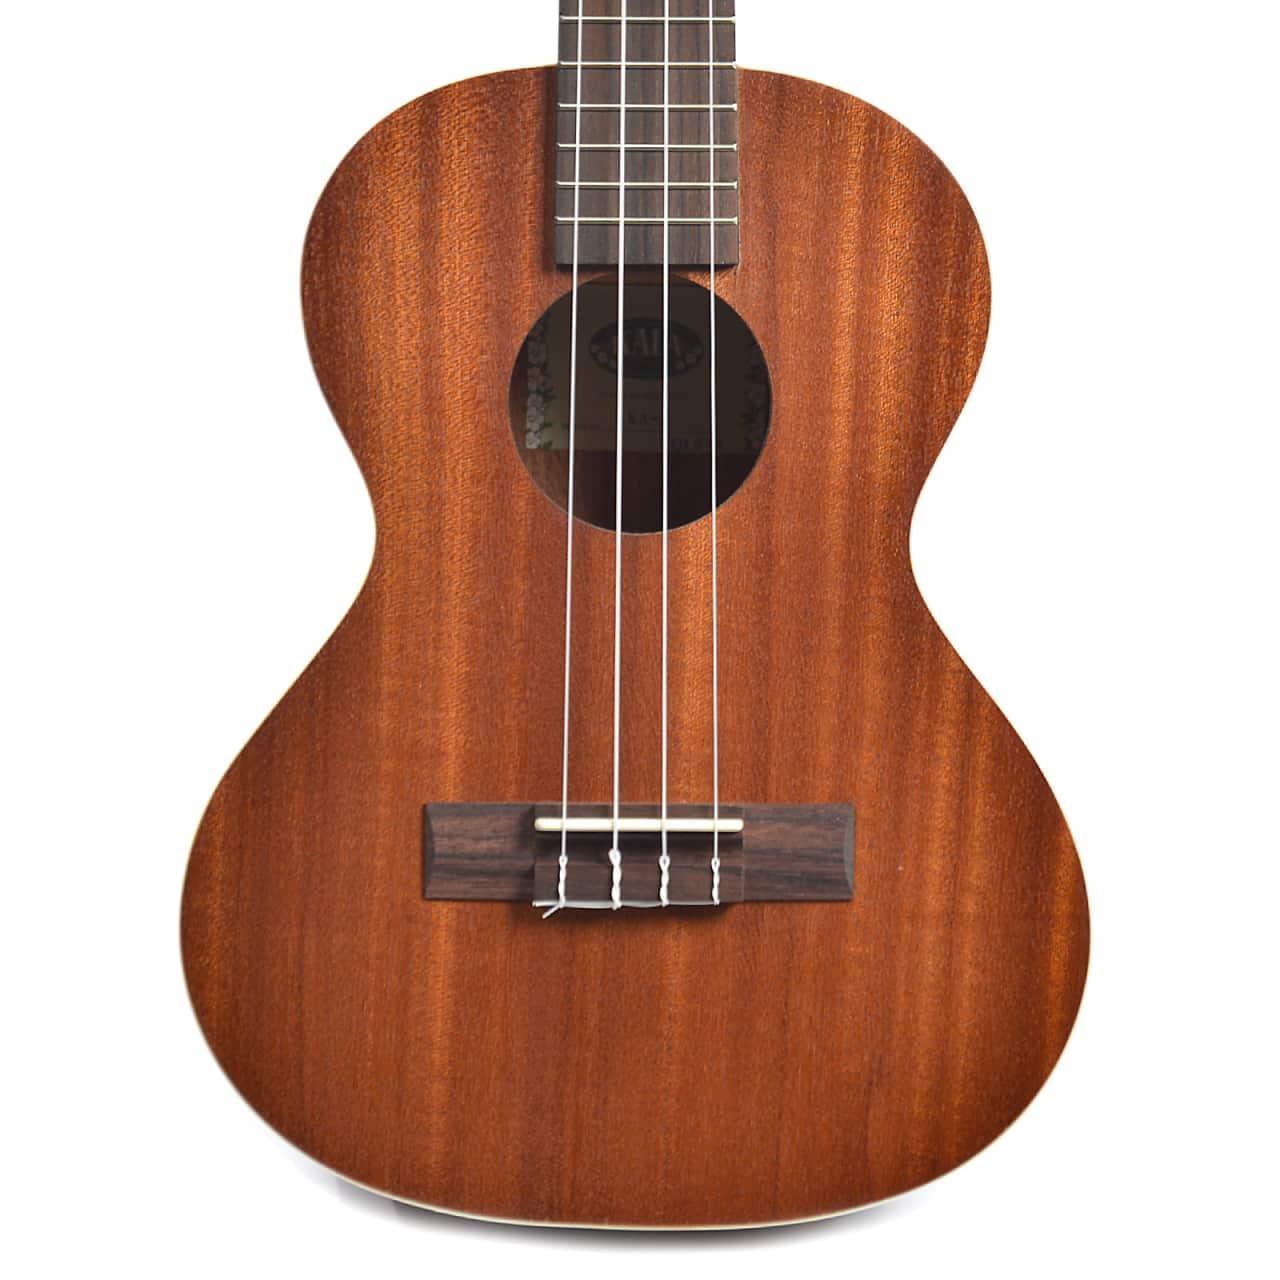 kala ka t tenor ukulele mahogany reverb. Black Bedroom Furniture Sets. Home Design Ideas